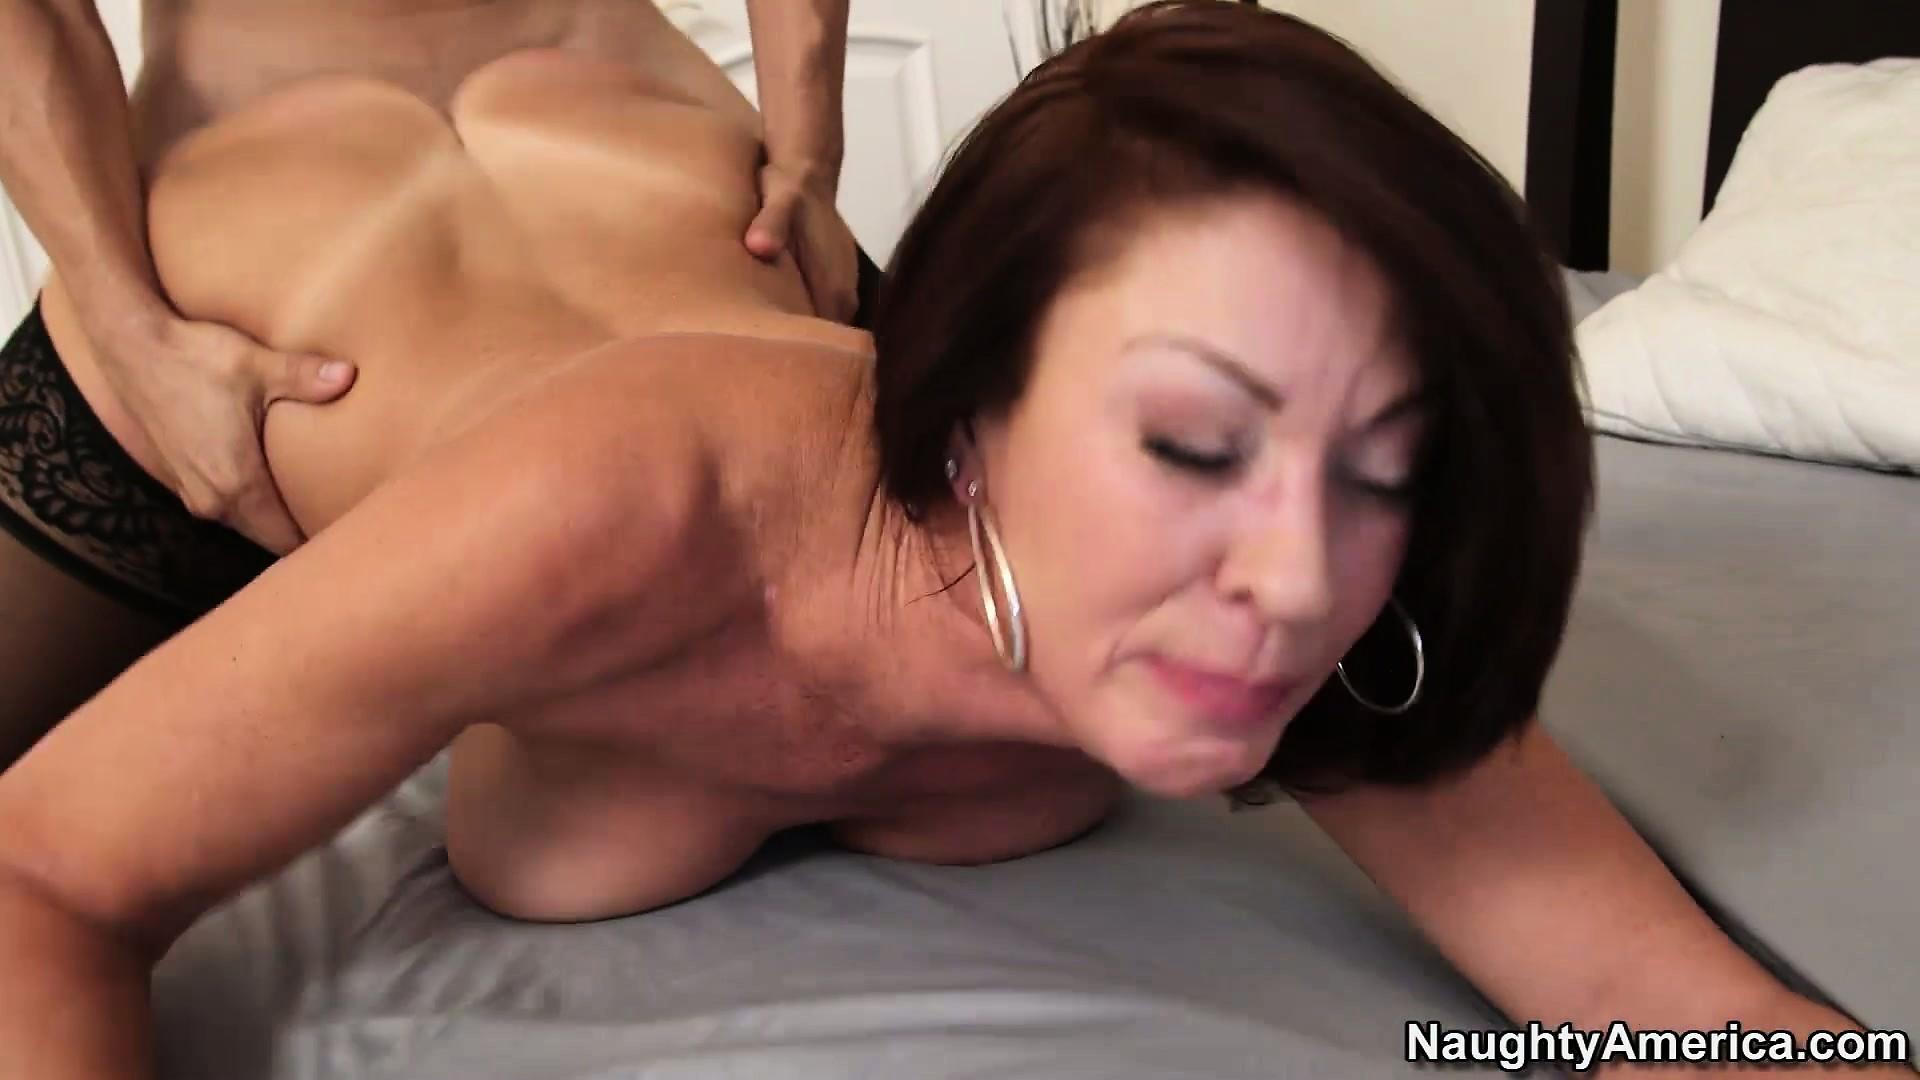 free erotic female wrestling clips